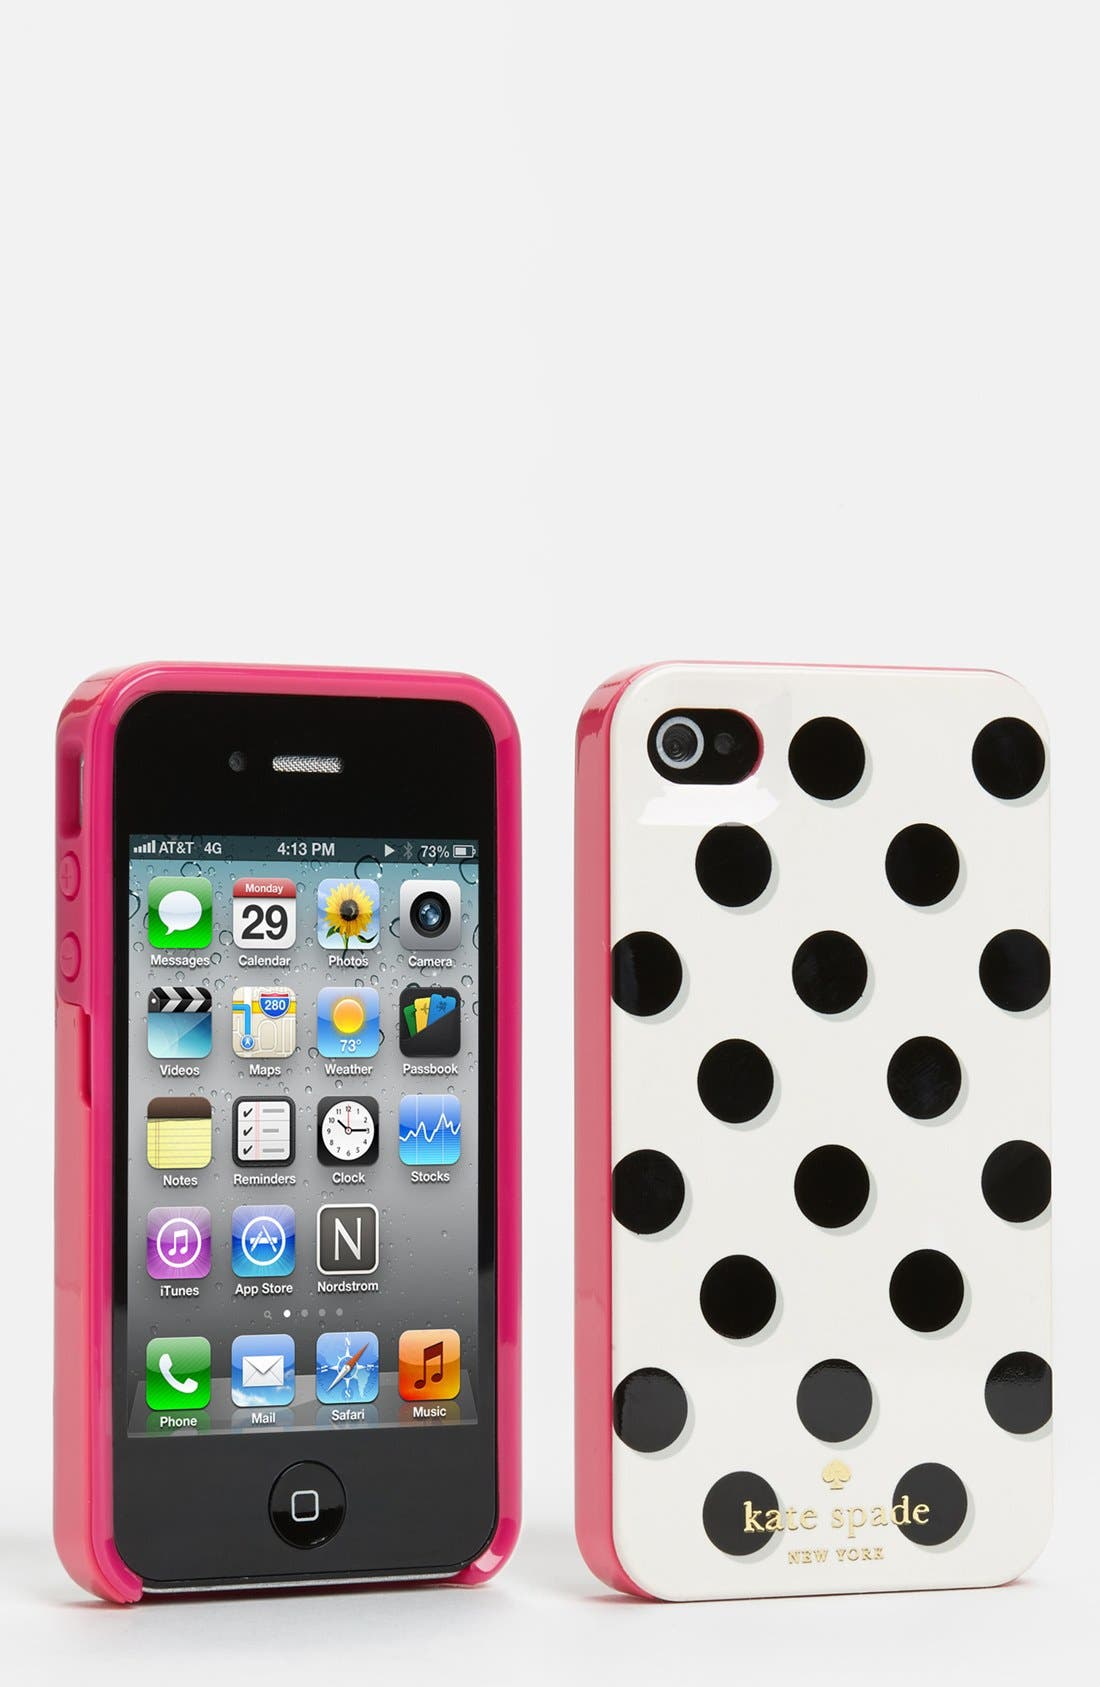 Main Image - kate spade new york iPhone 4 & 4S case